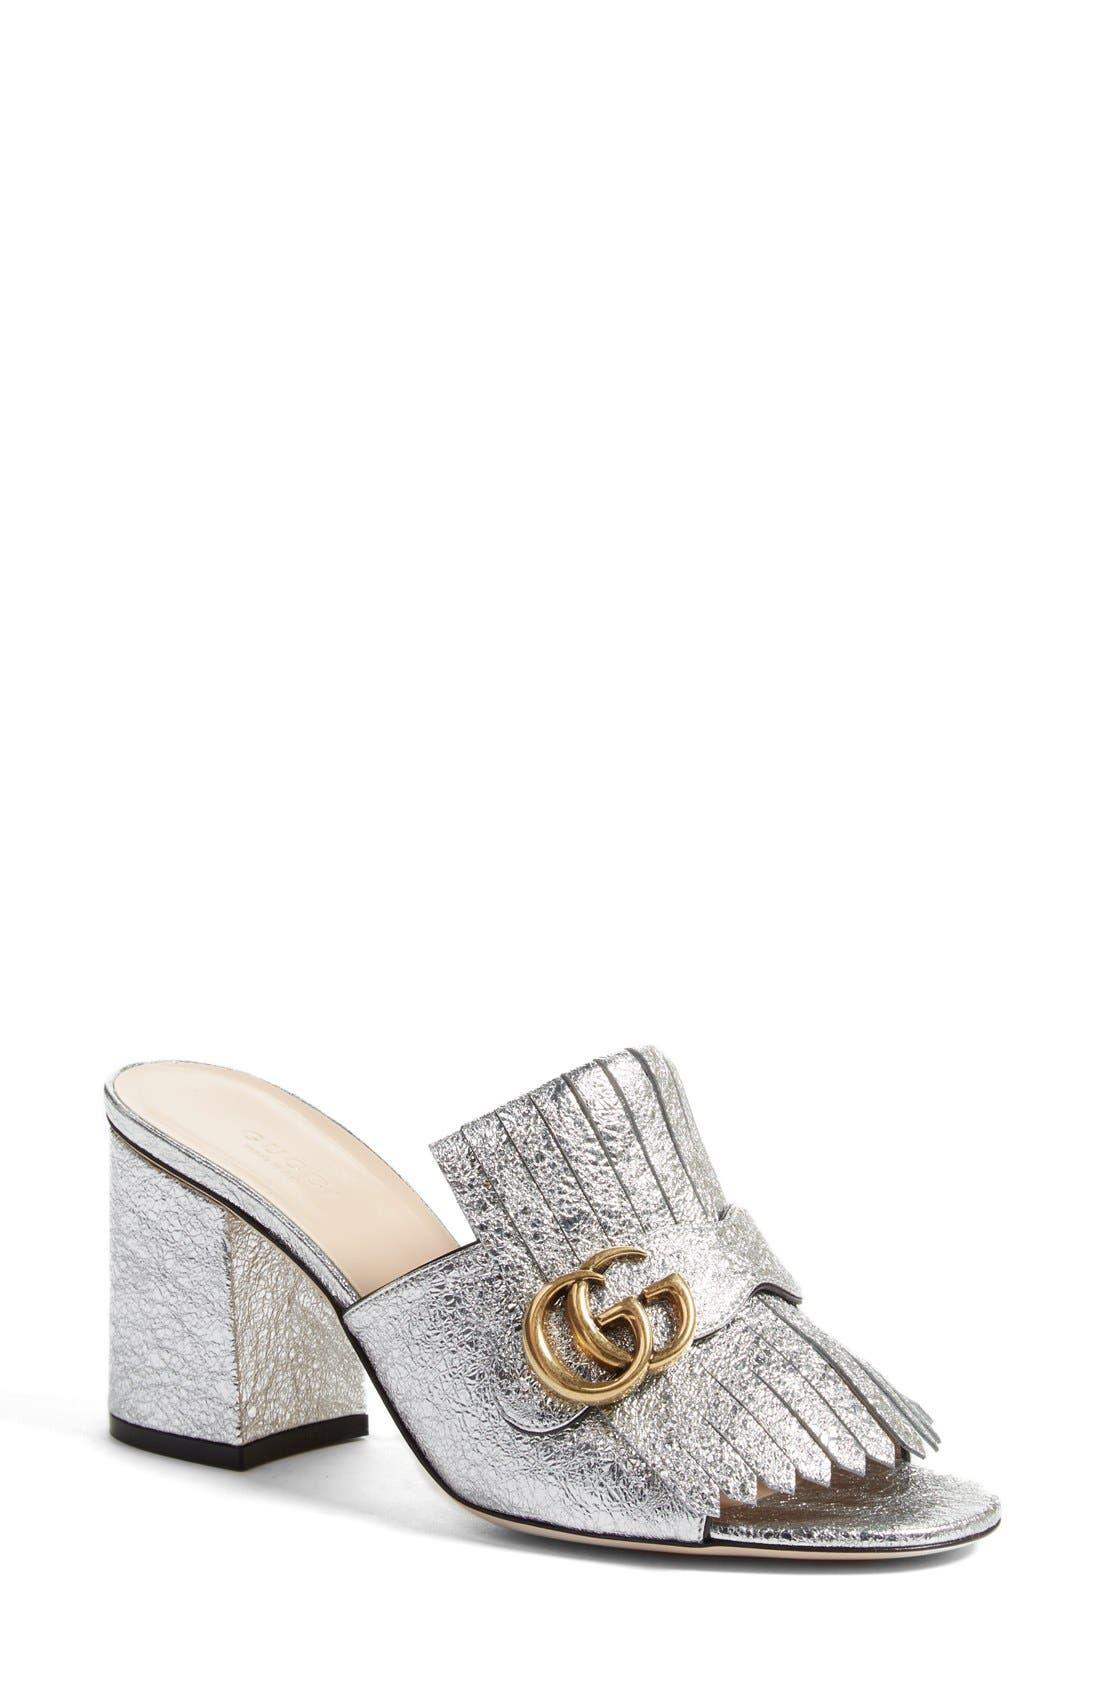 Main Image - Gucci GG Marmont Peep Toe Kiltie Mule (Women)